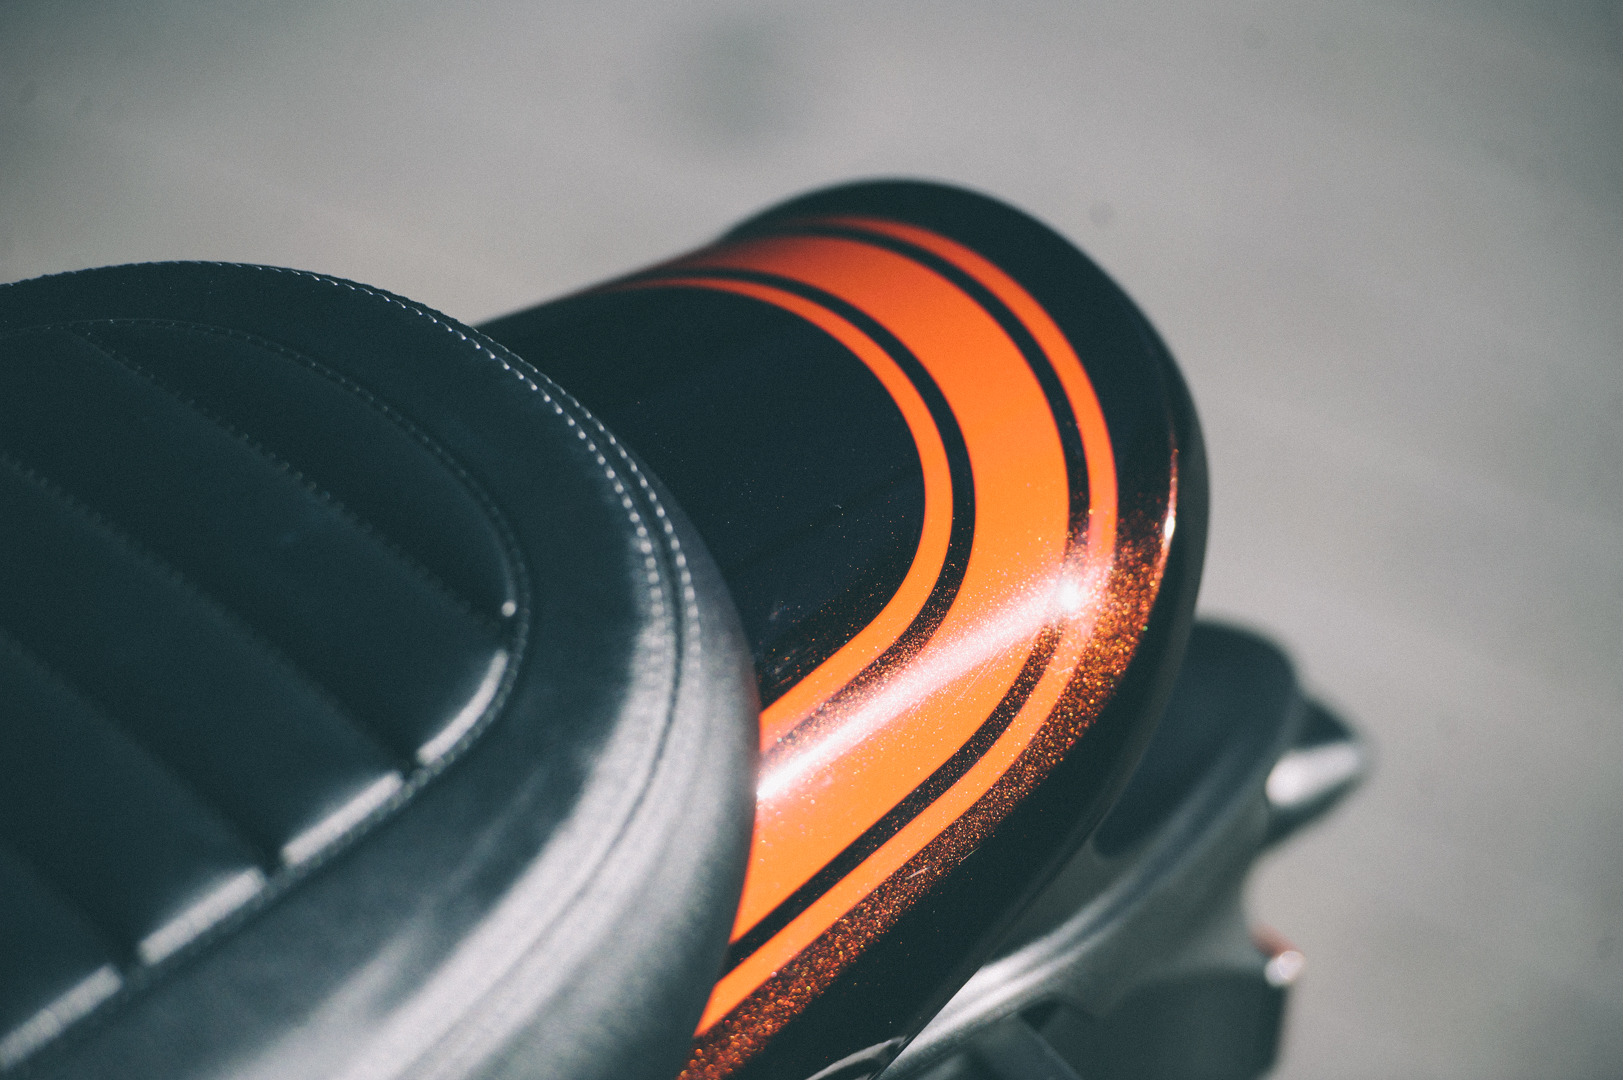 kawasaki Z900 RS Z900RS test avis prix date comparatif